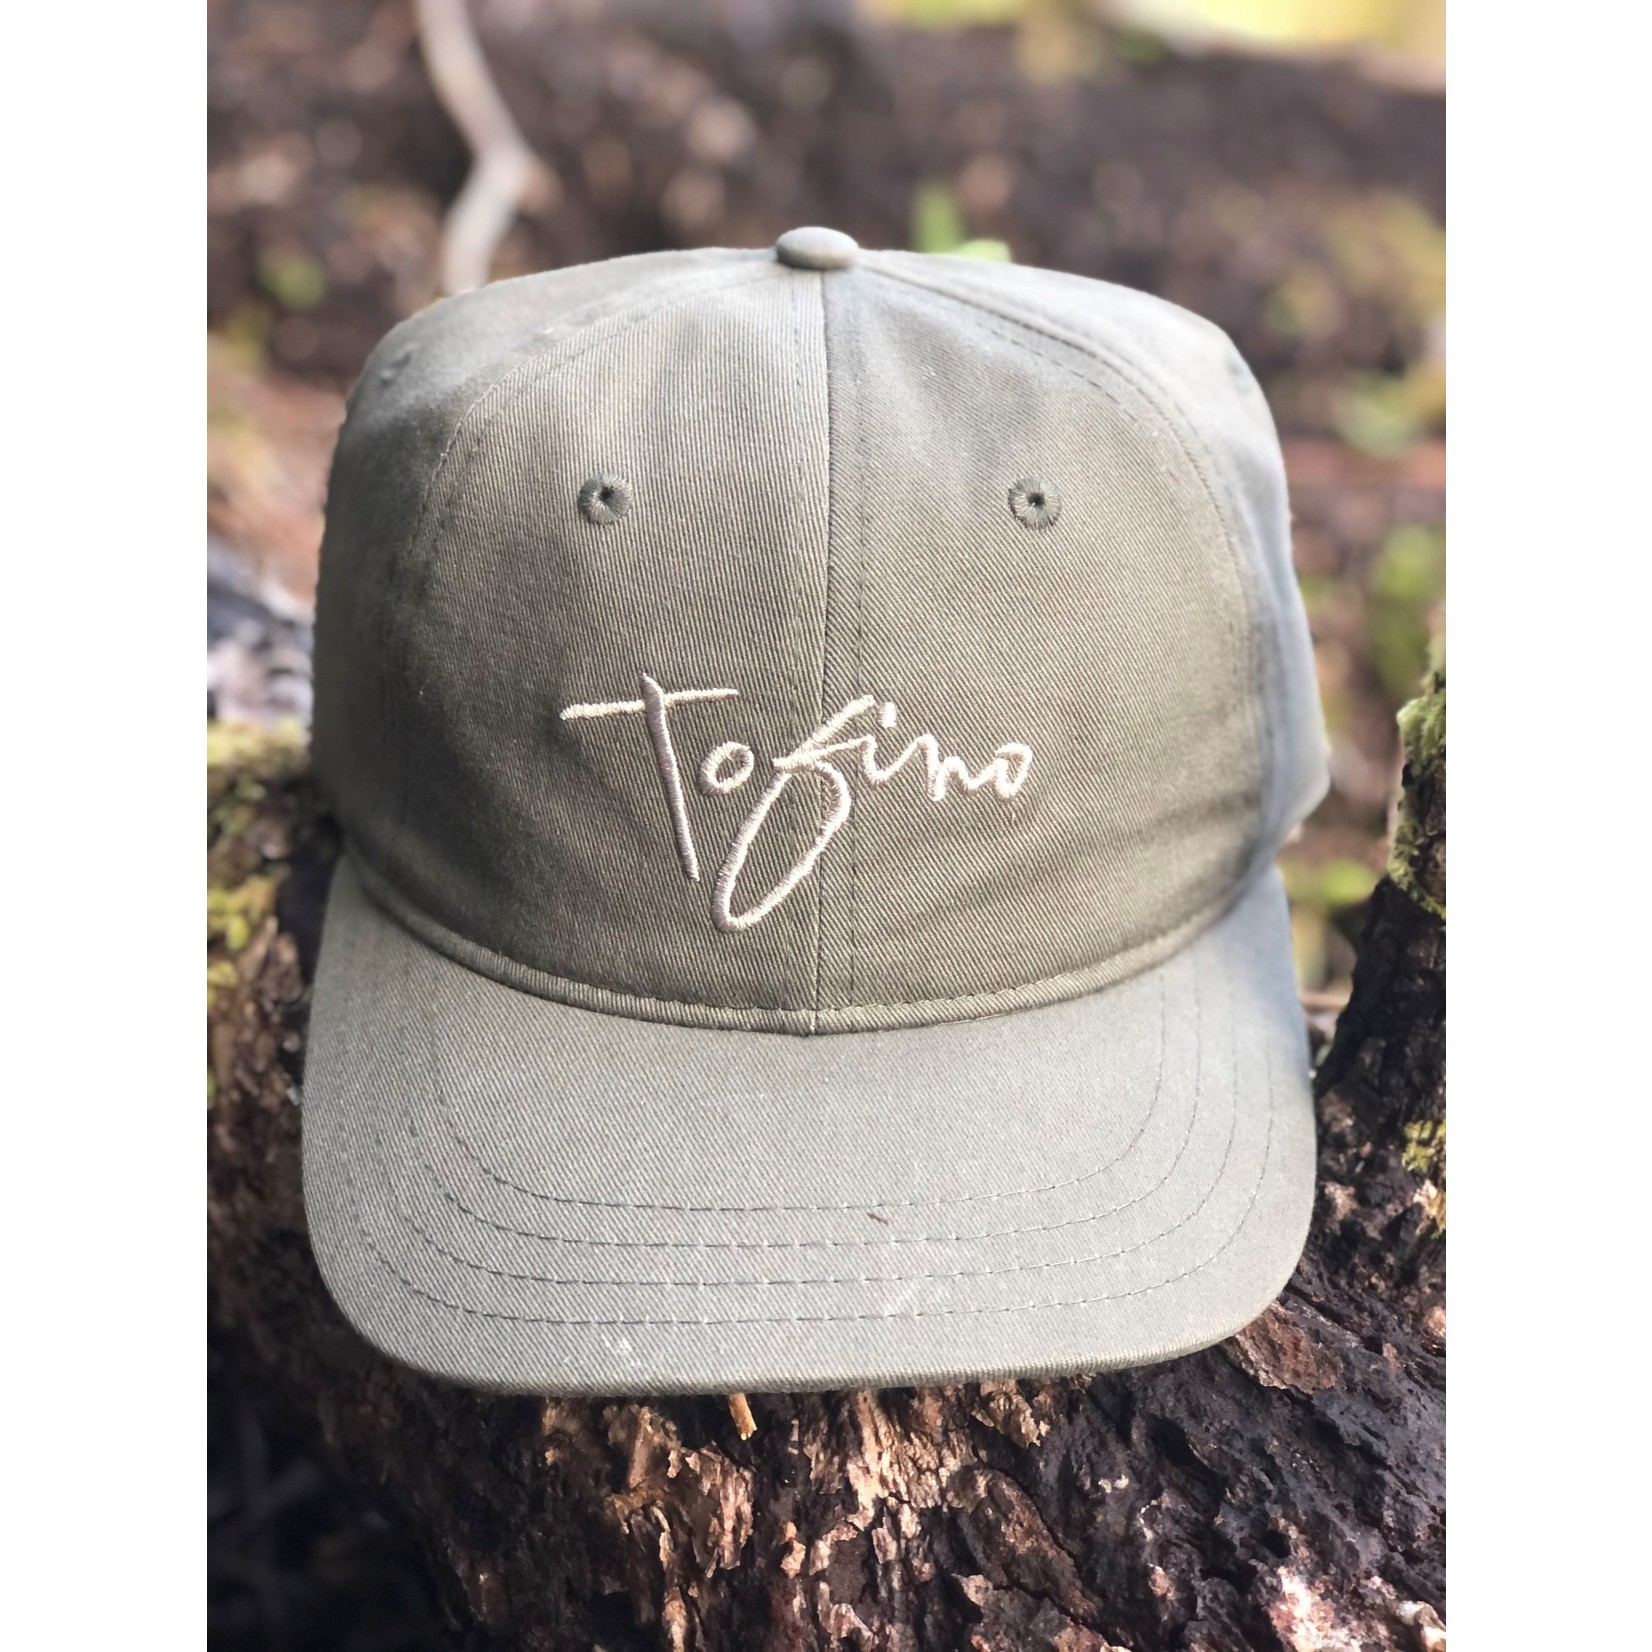 Tourism Tofino Baseball Cap